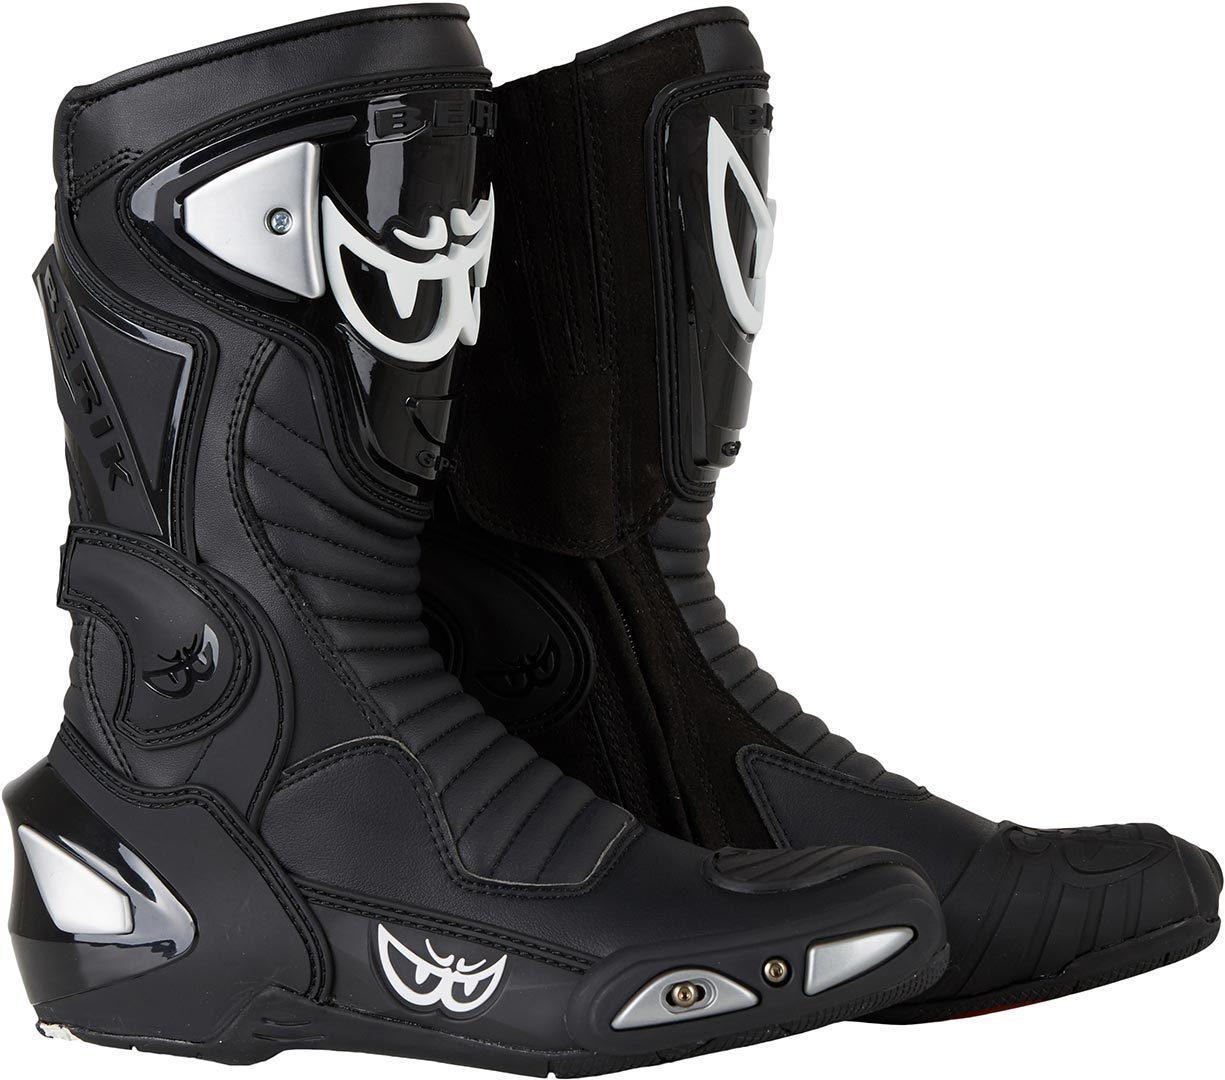 Berik Race-X Motorradstiefel, schwarz, Größe 40, schwarz, Größe 40